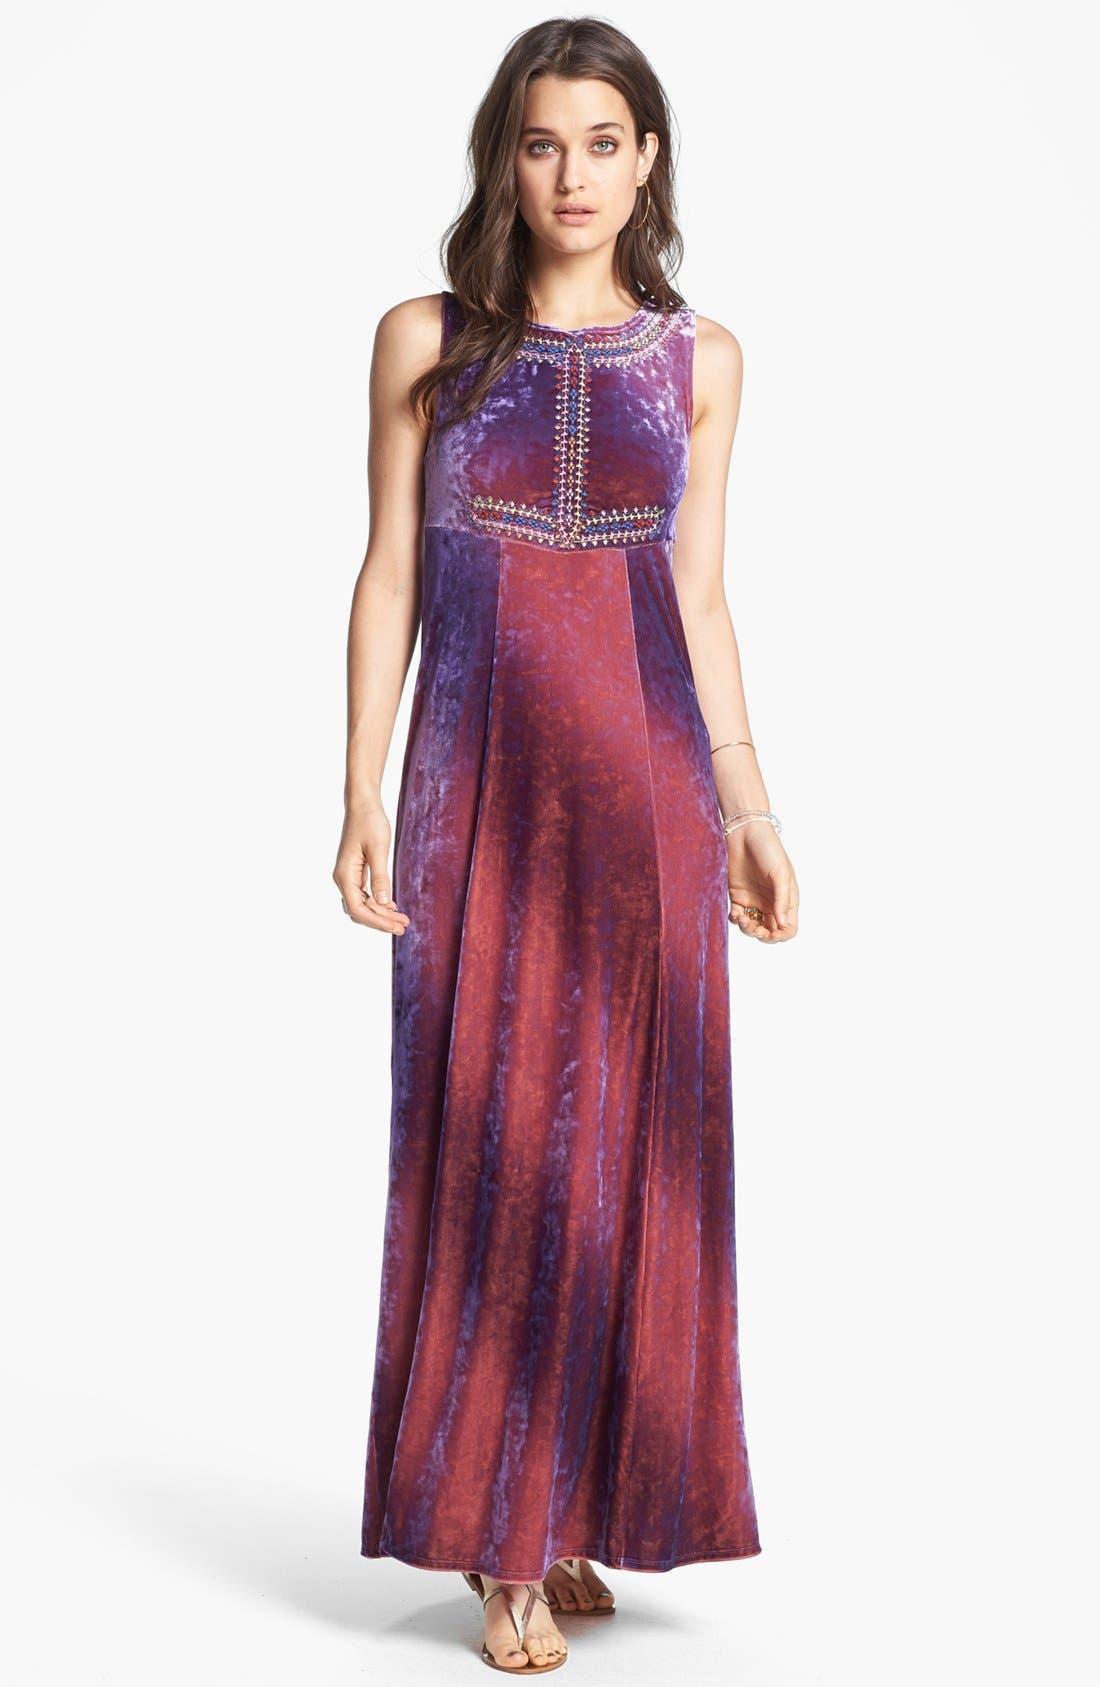 Main Image - Free People 'Sunset' Embroidered Crushed Velvet Maxi Dress